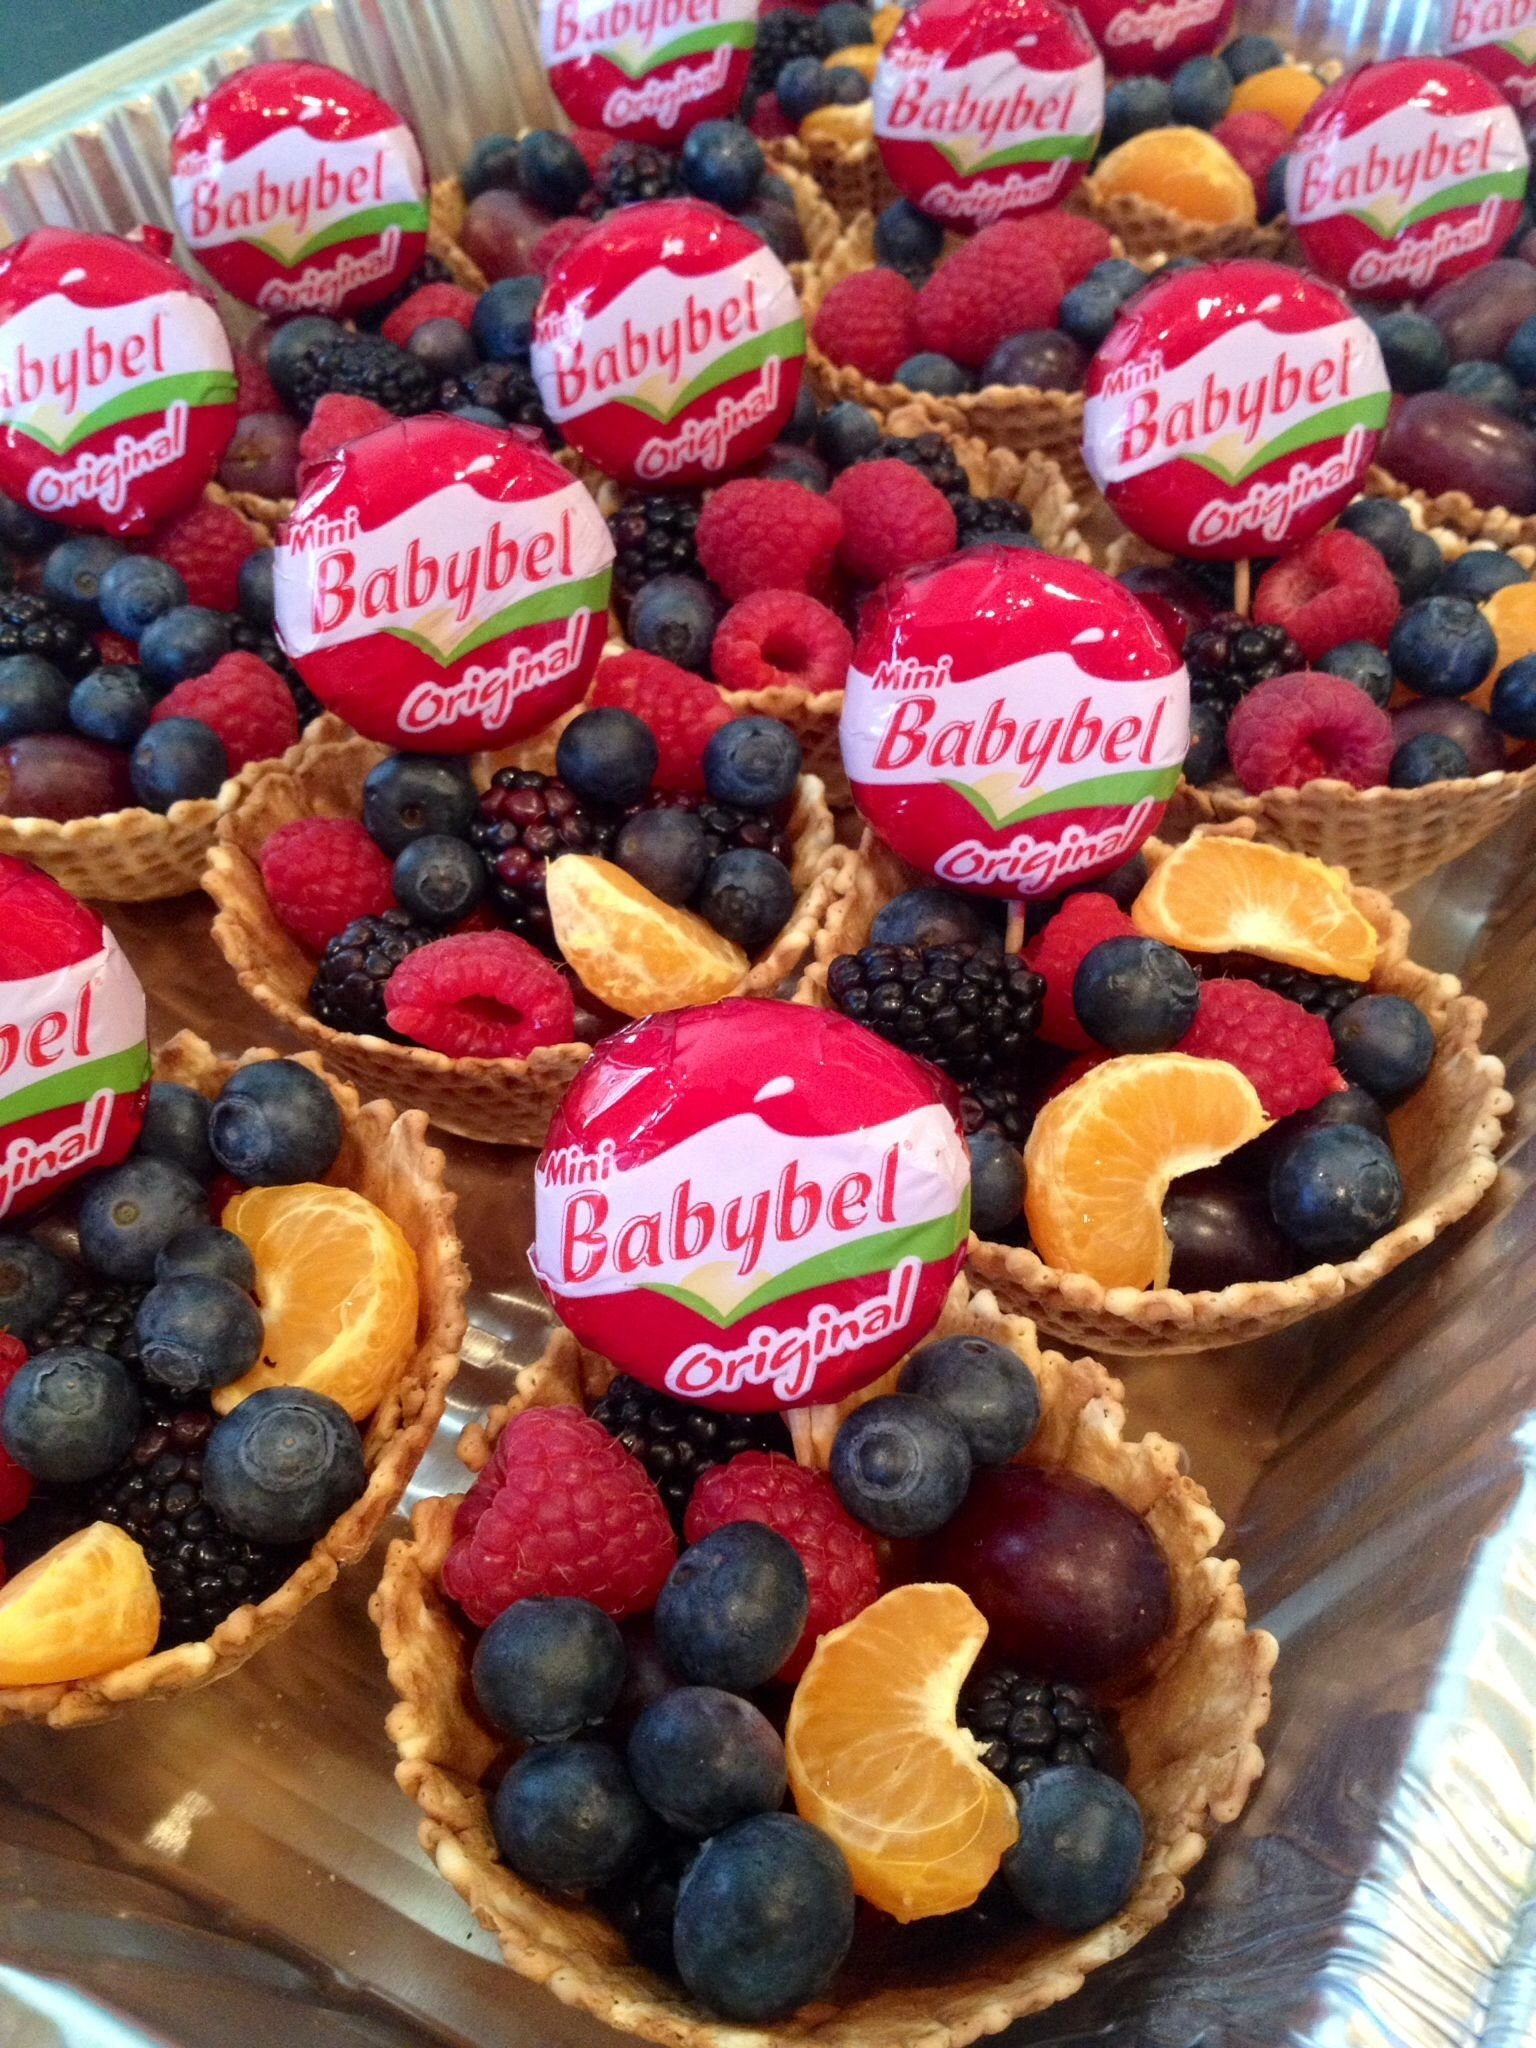 10 Attractive Snack Ideas For Kindergarten Class healthy birthday treat for kids pinteres 1 2021